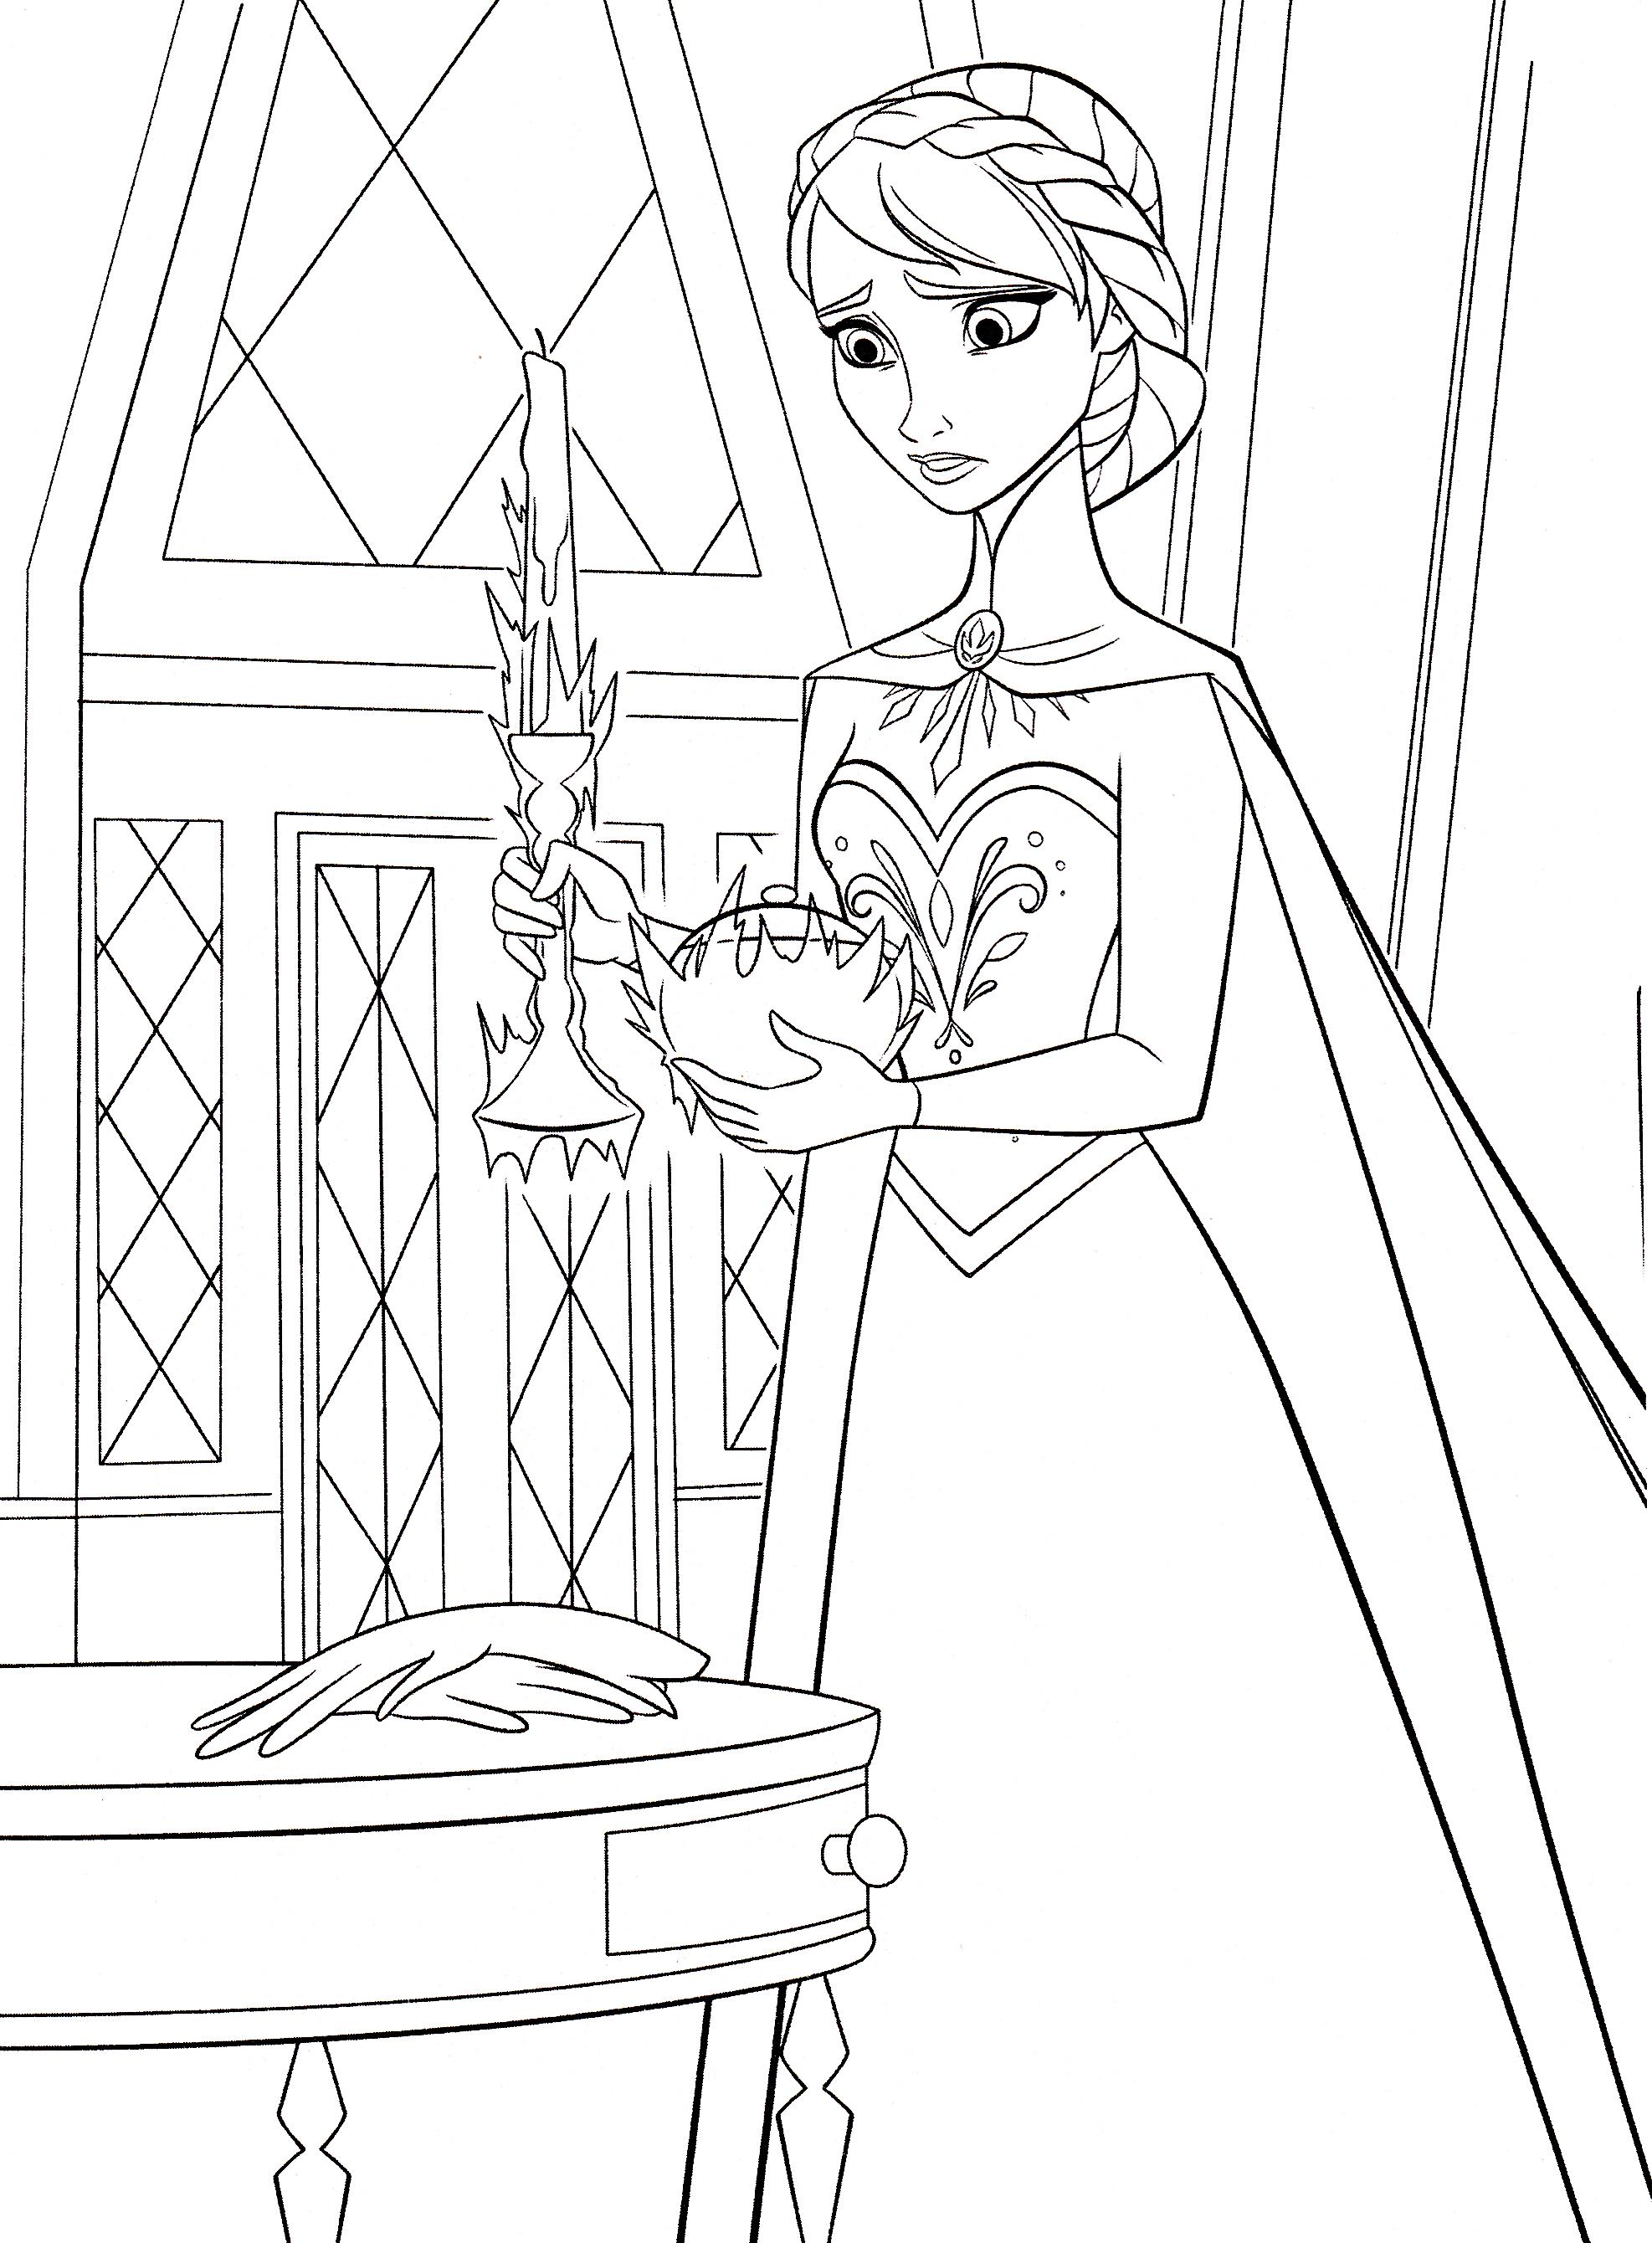 Walt Disney Coloring Pages Queen Elsa Walt Disney Characters Best Colooring Page Haftalik Planlayici Planlayici